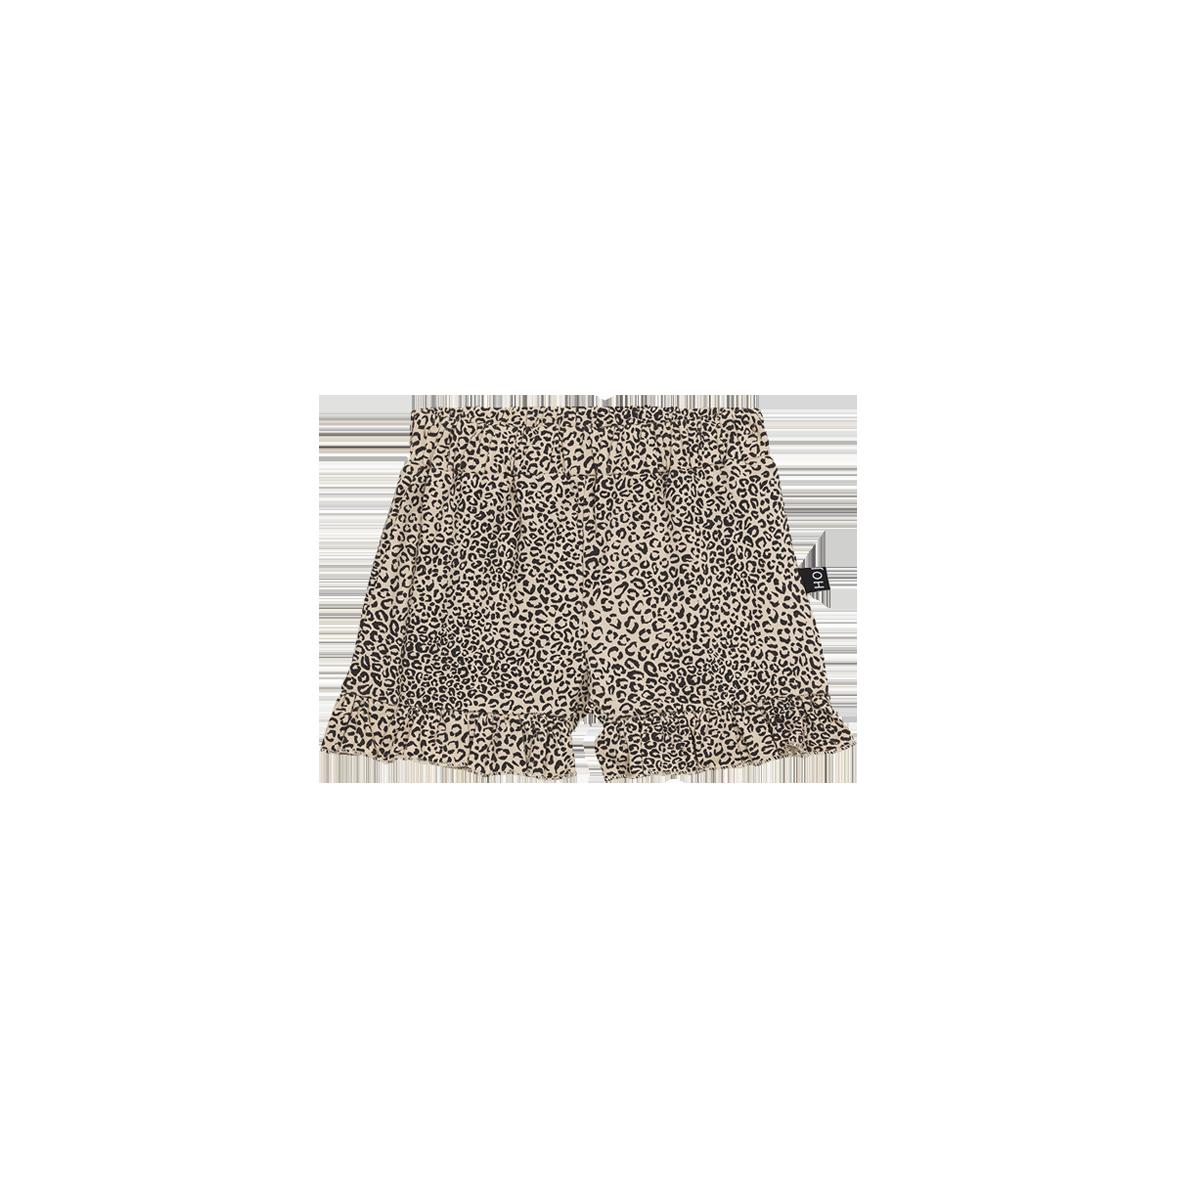 Ruffled Shorts Charcoal Little Leopard